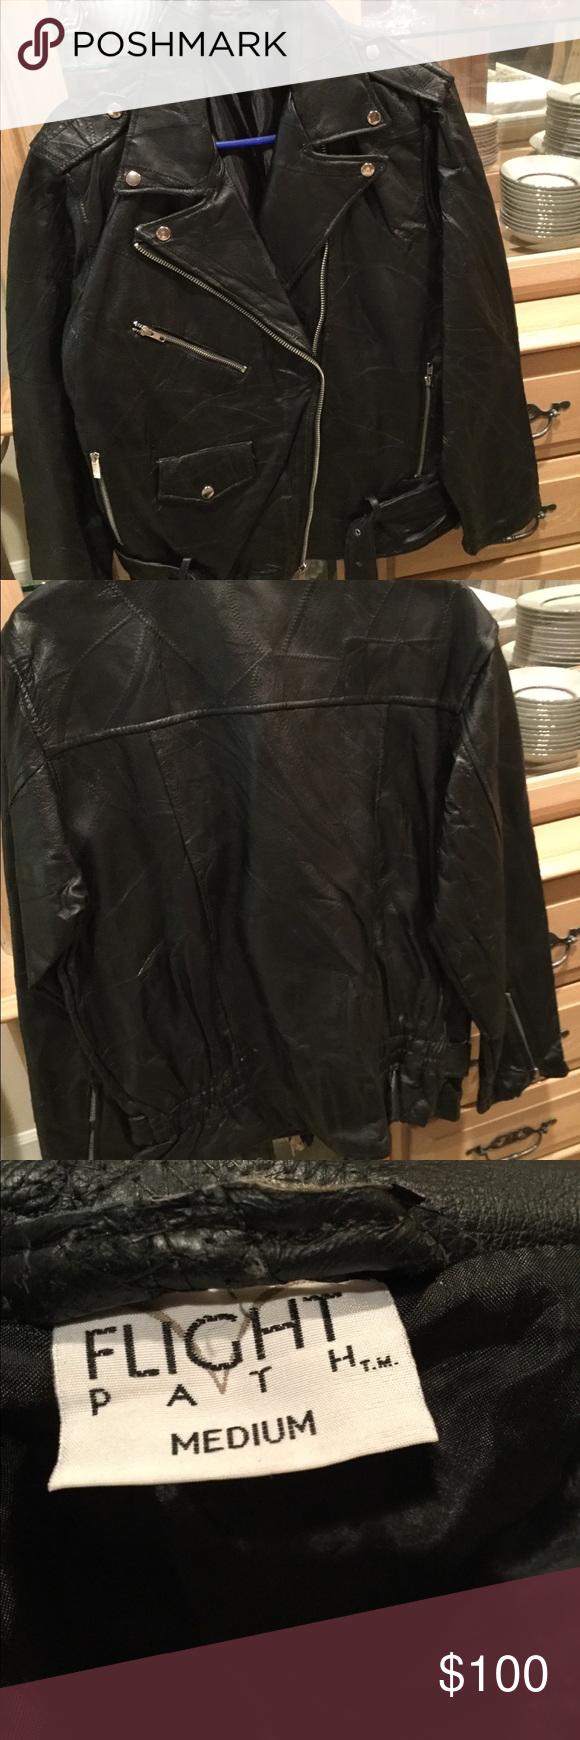 Flight Path Mens Leather Motorcycle Jacket Pinterest Motorcycle